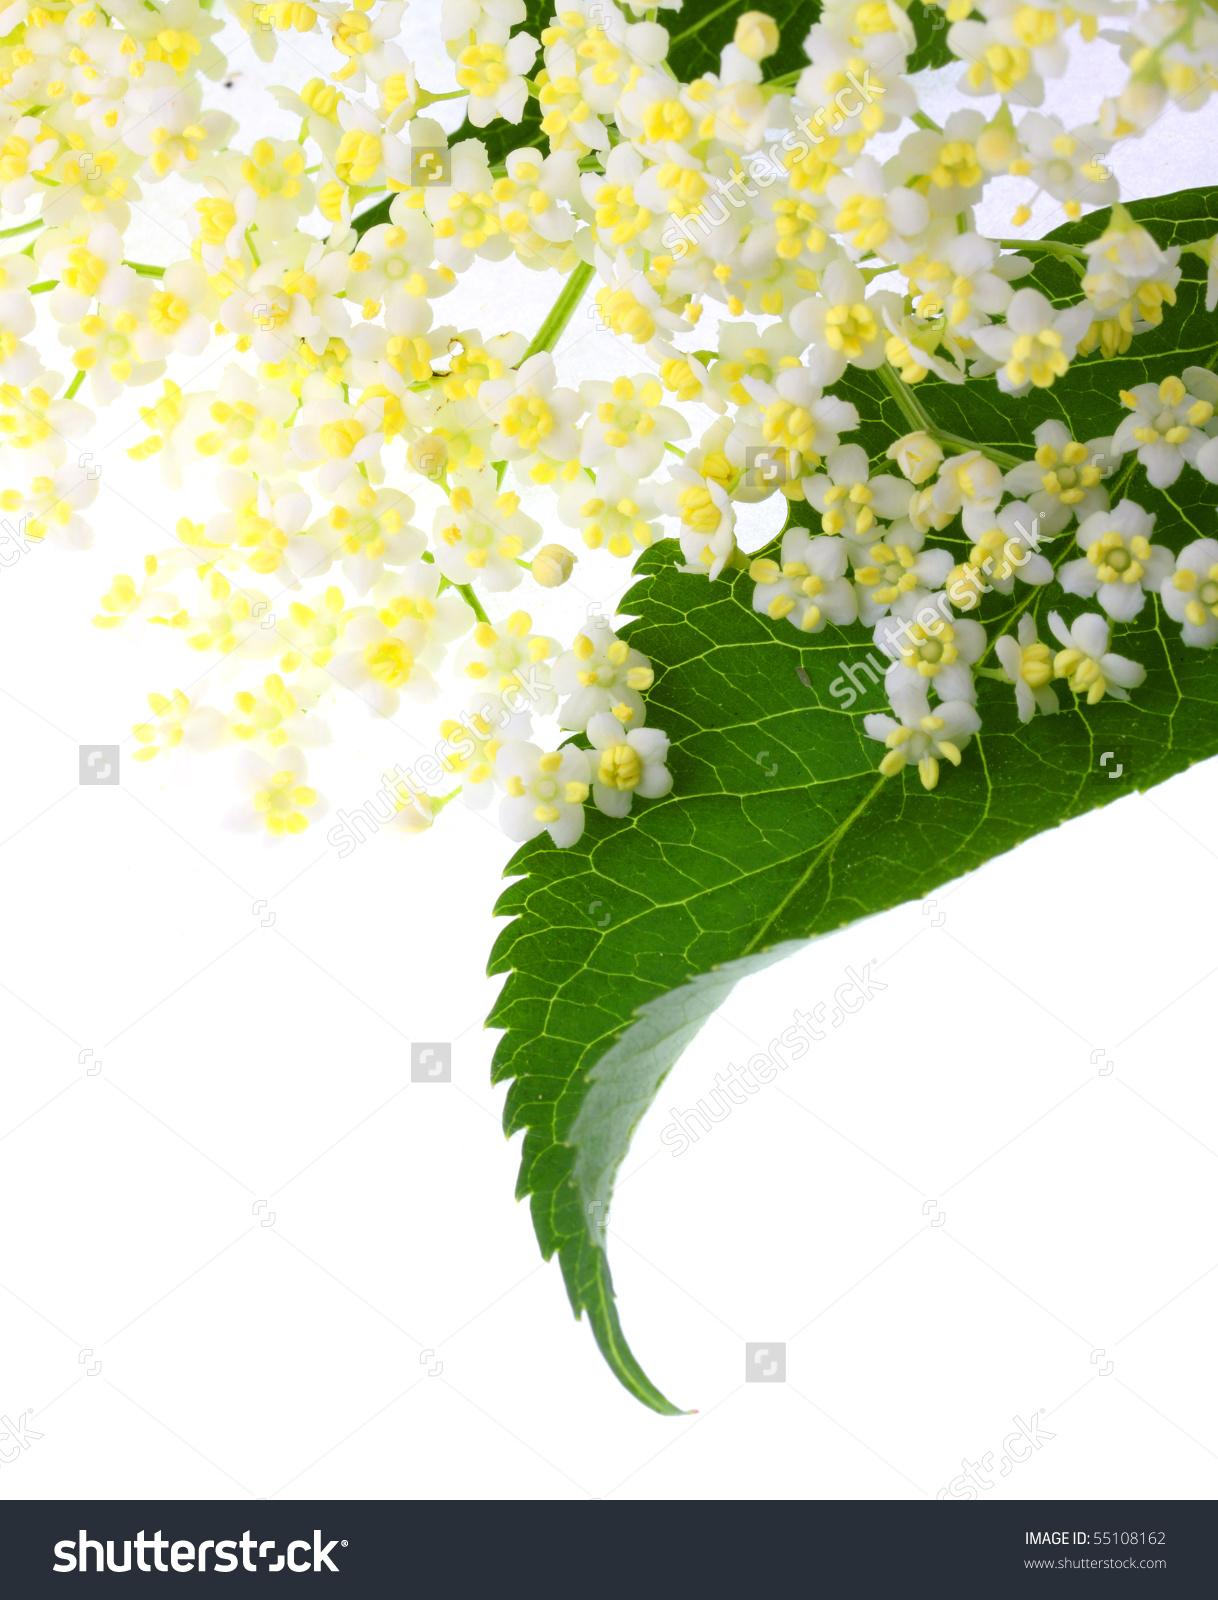 The Elder Or Elderberry (Sambucus Nigra).The Flowers And Berries.